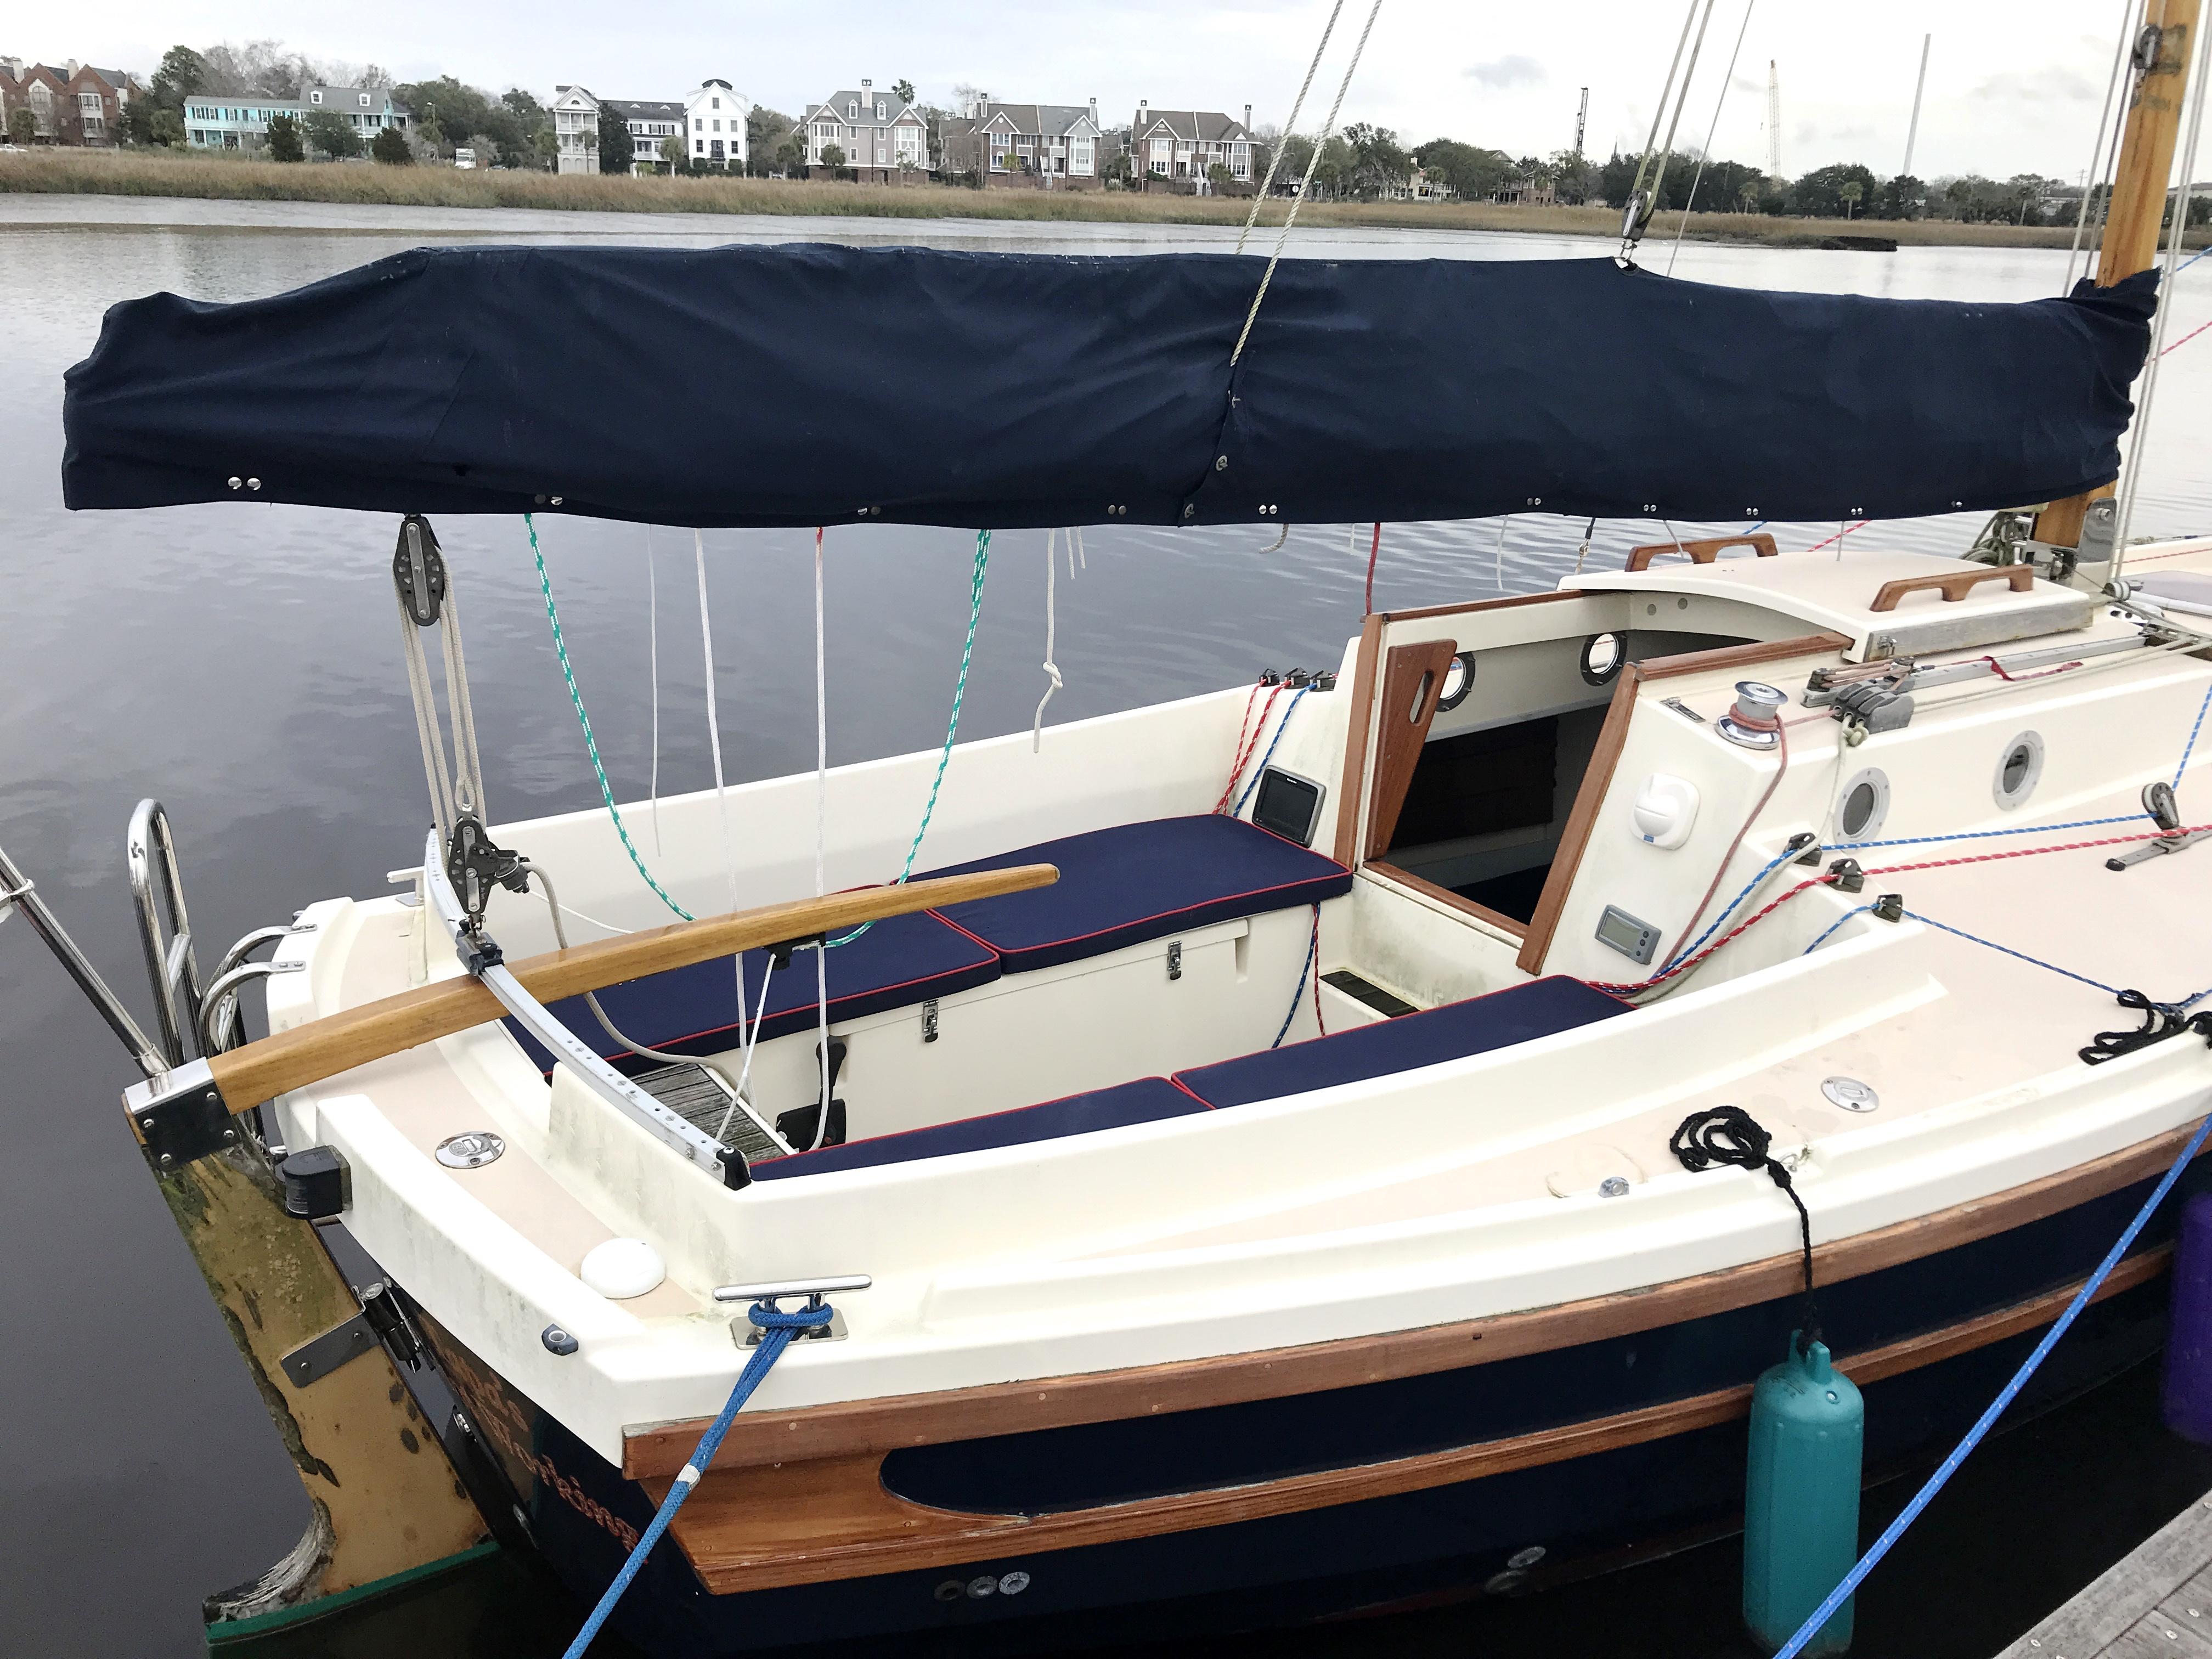 Cornish Crabbers Crabber 22 - main sail cover